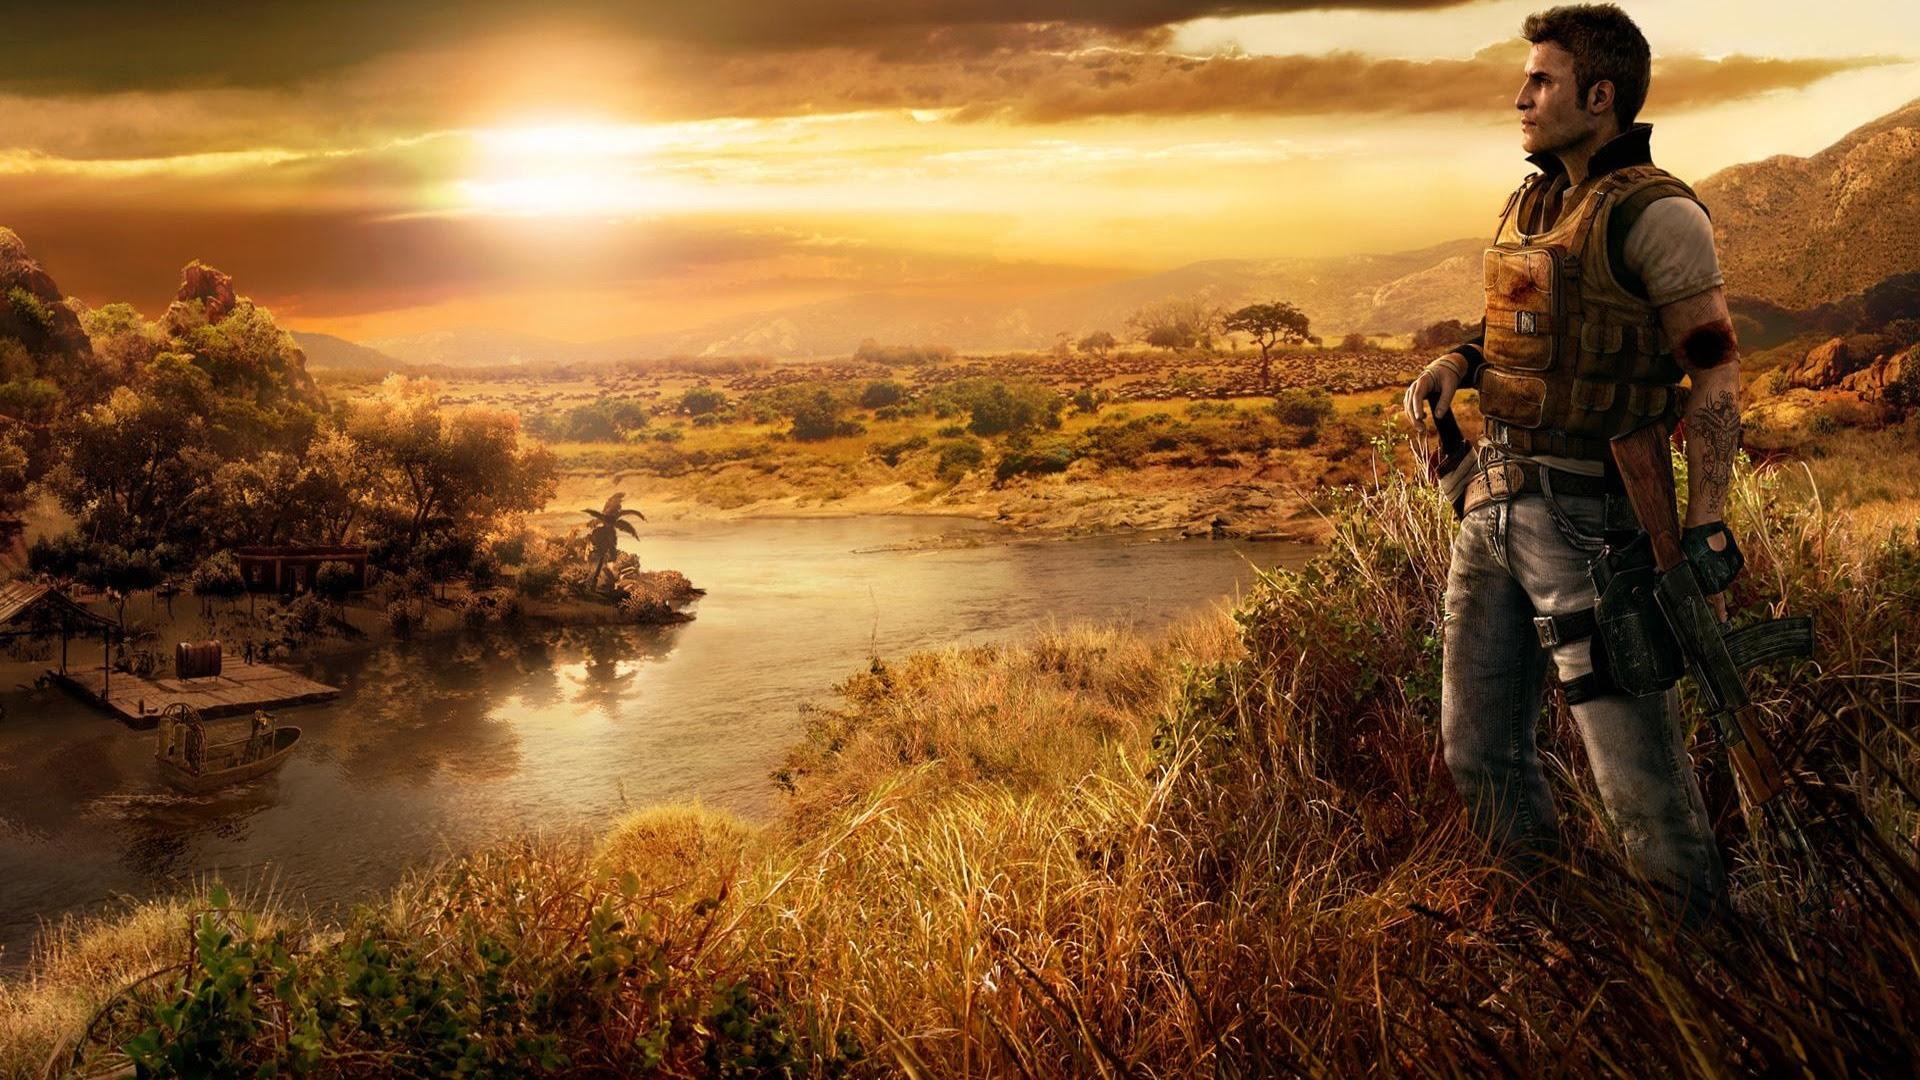 Far Cry 4 Wallpaper Game Hd Desktop Wallpapers 4k Hd